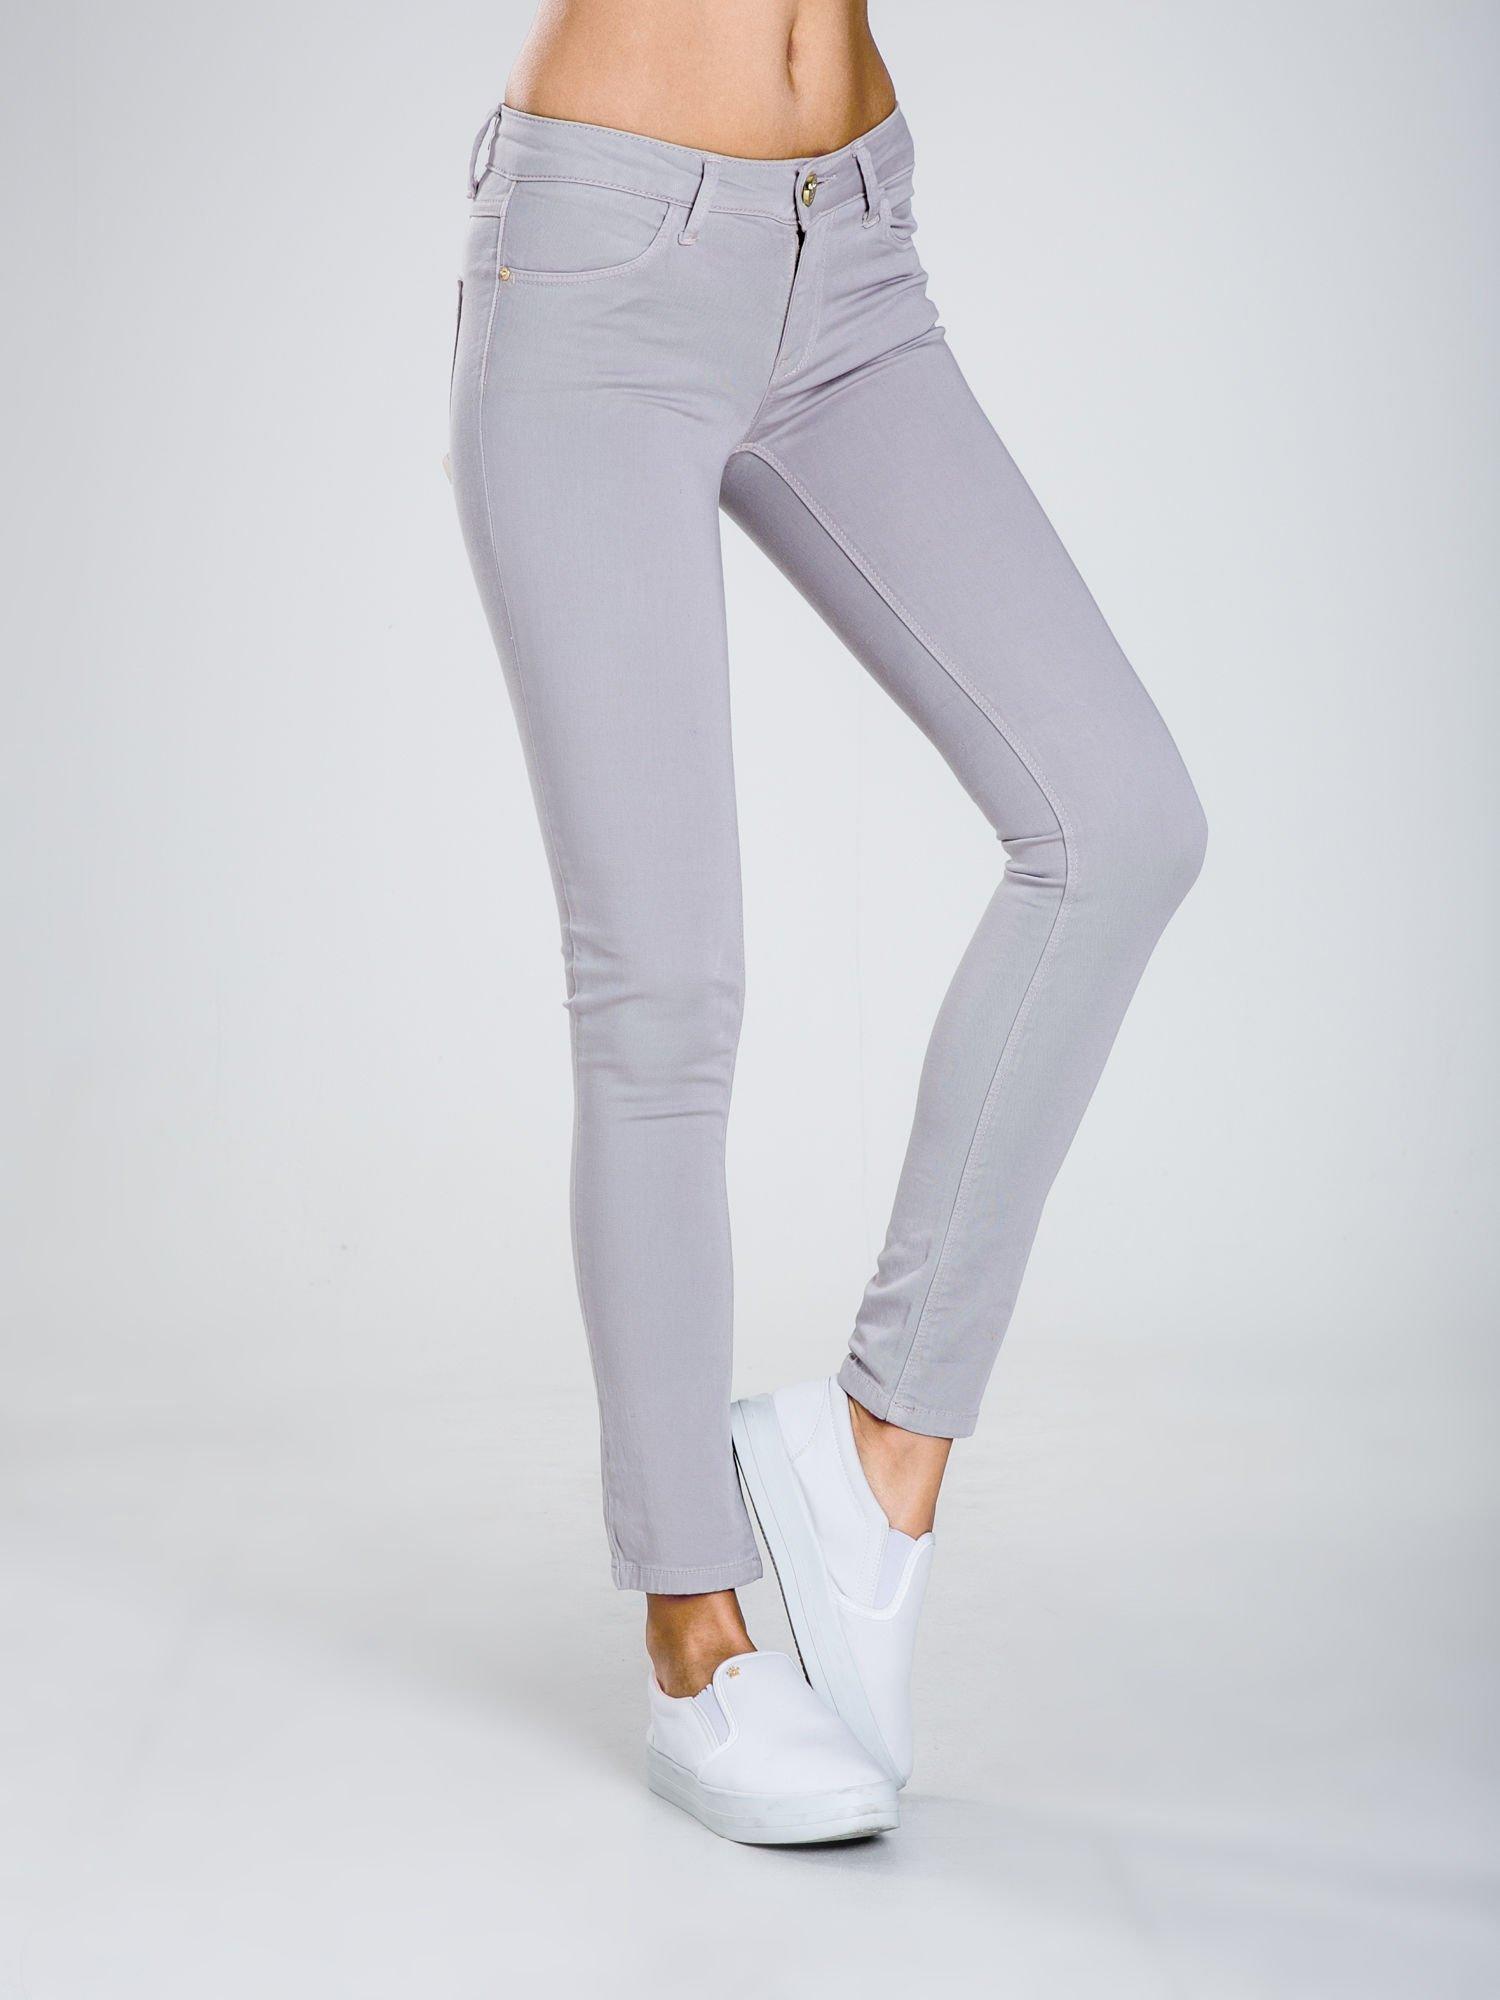 STRADIVARIUS Szare spodnie skinny typu rurki                                  zdj.                                  1